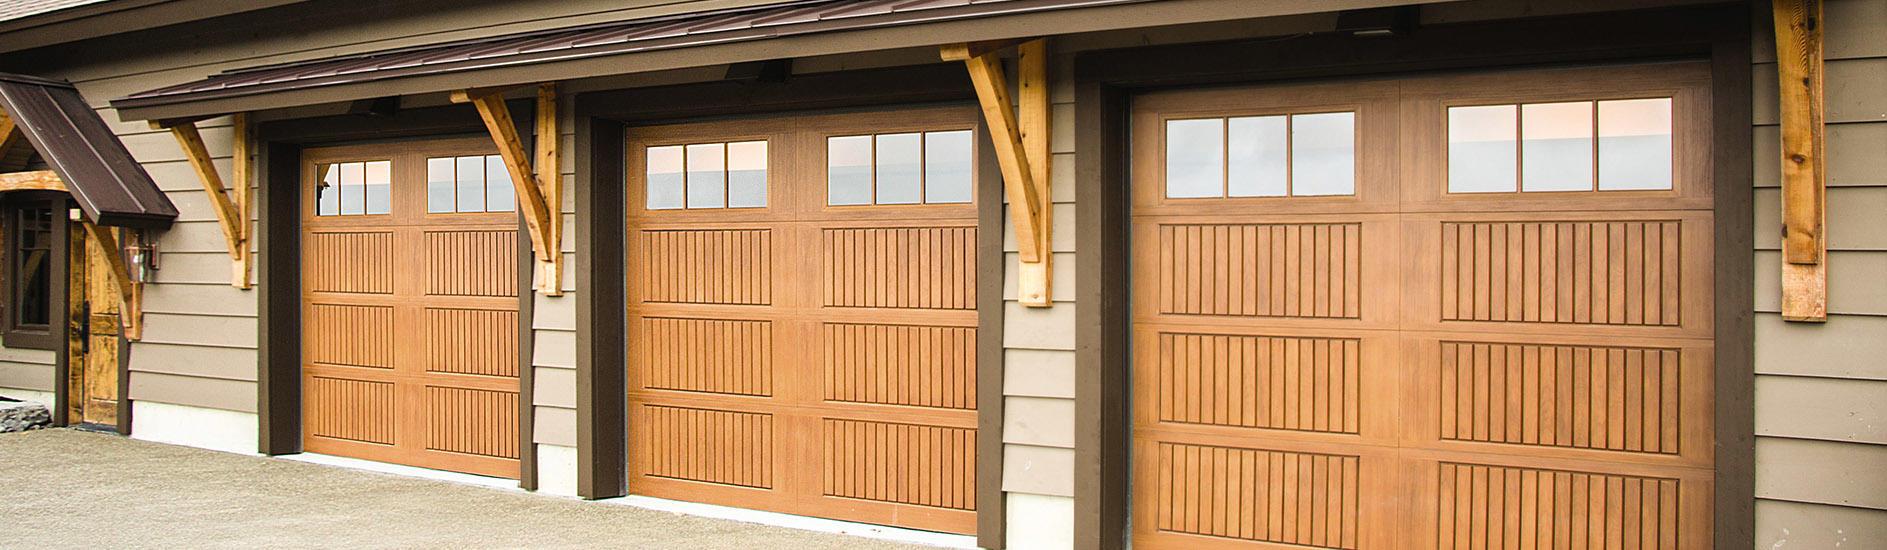 Garage Door Repair Salem MA image 0